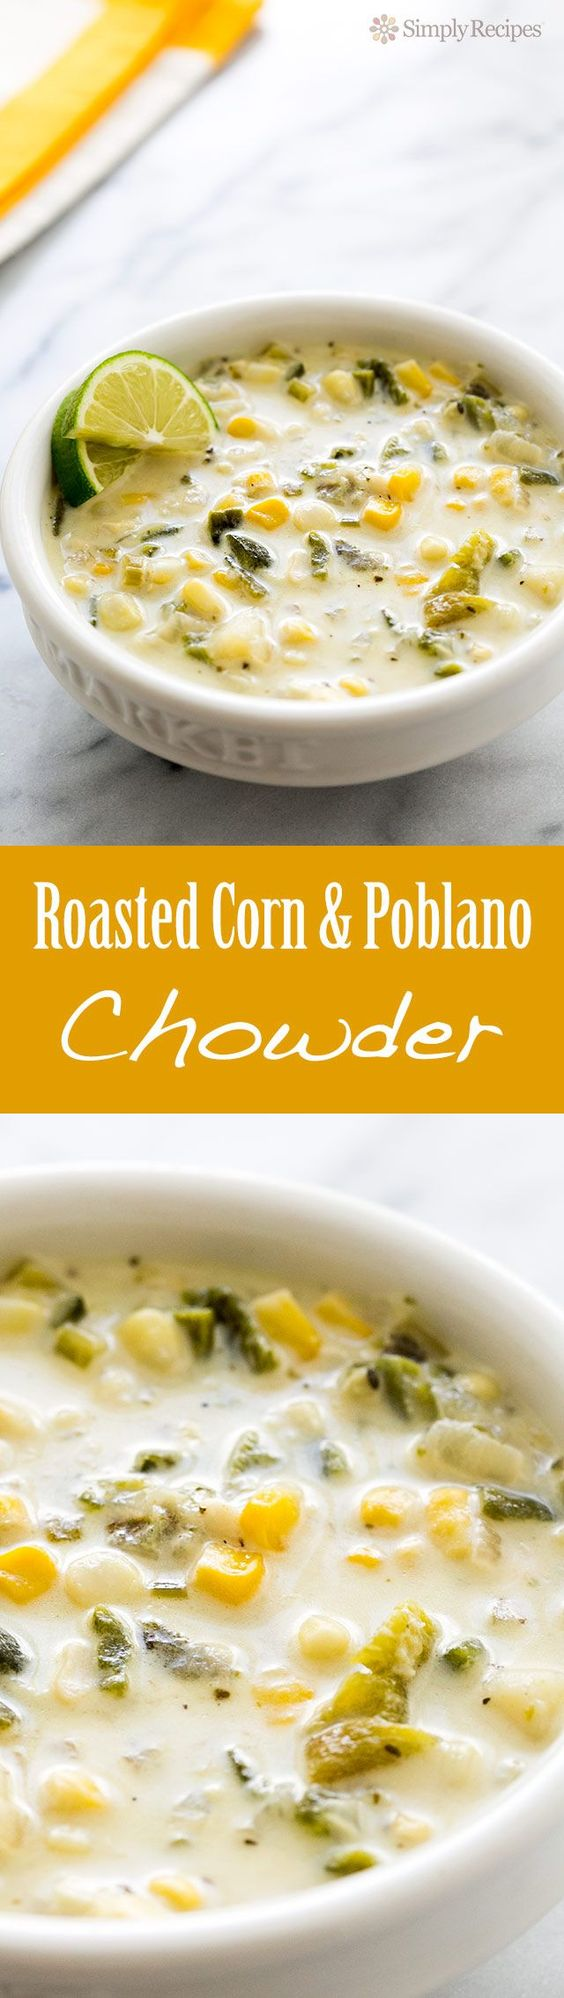 Roasted Poblano Corn Chowder ~ Rich corn chowder with roasted poblanos, fresh corn, potatoes, onions, stock, and cream. ~ SimplyRecipes.com